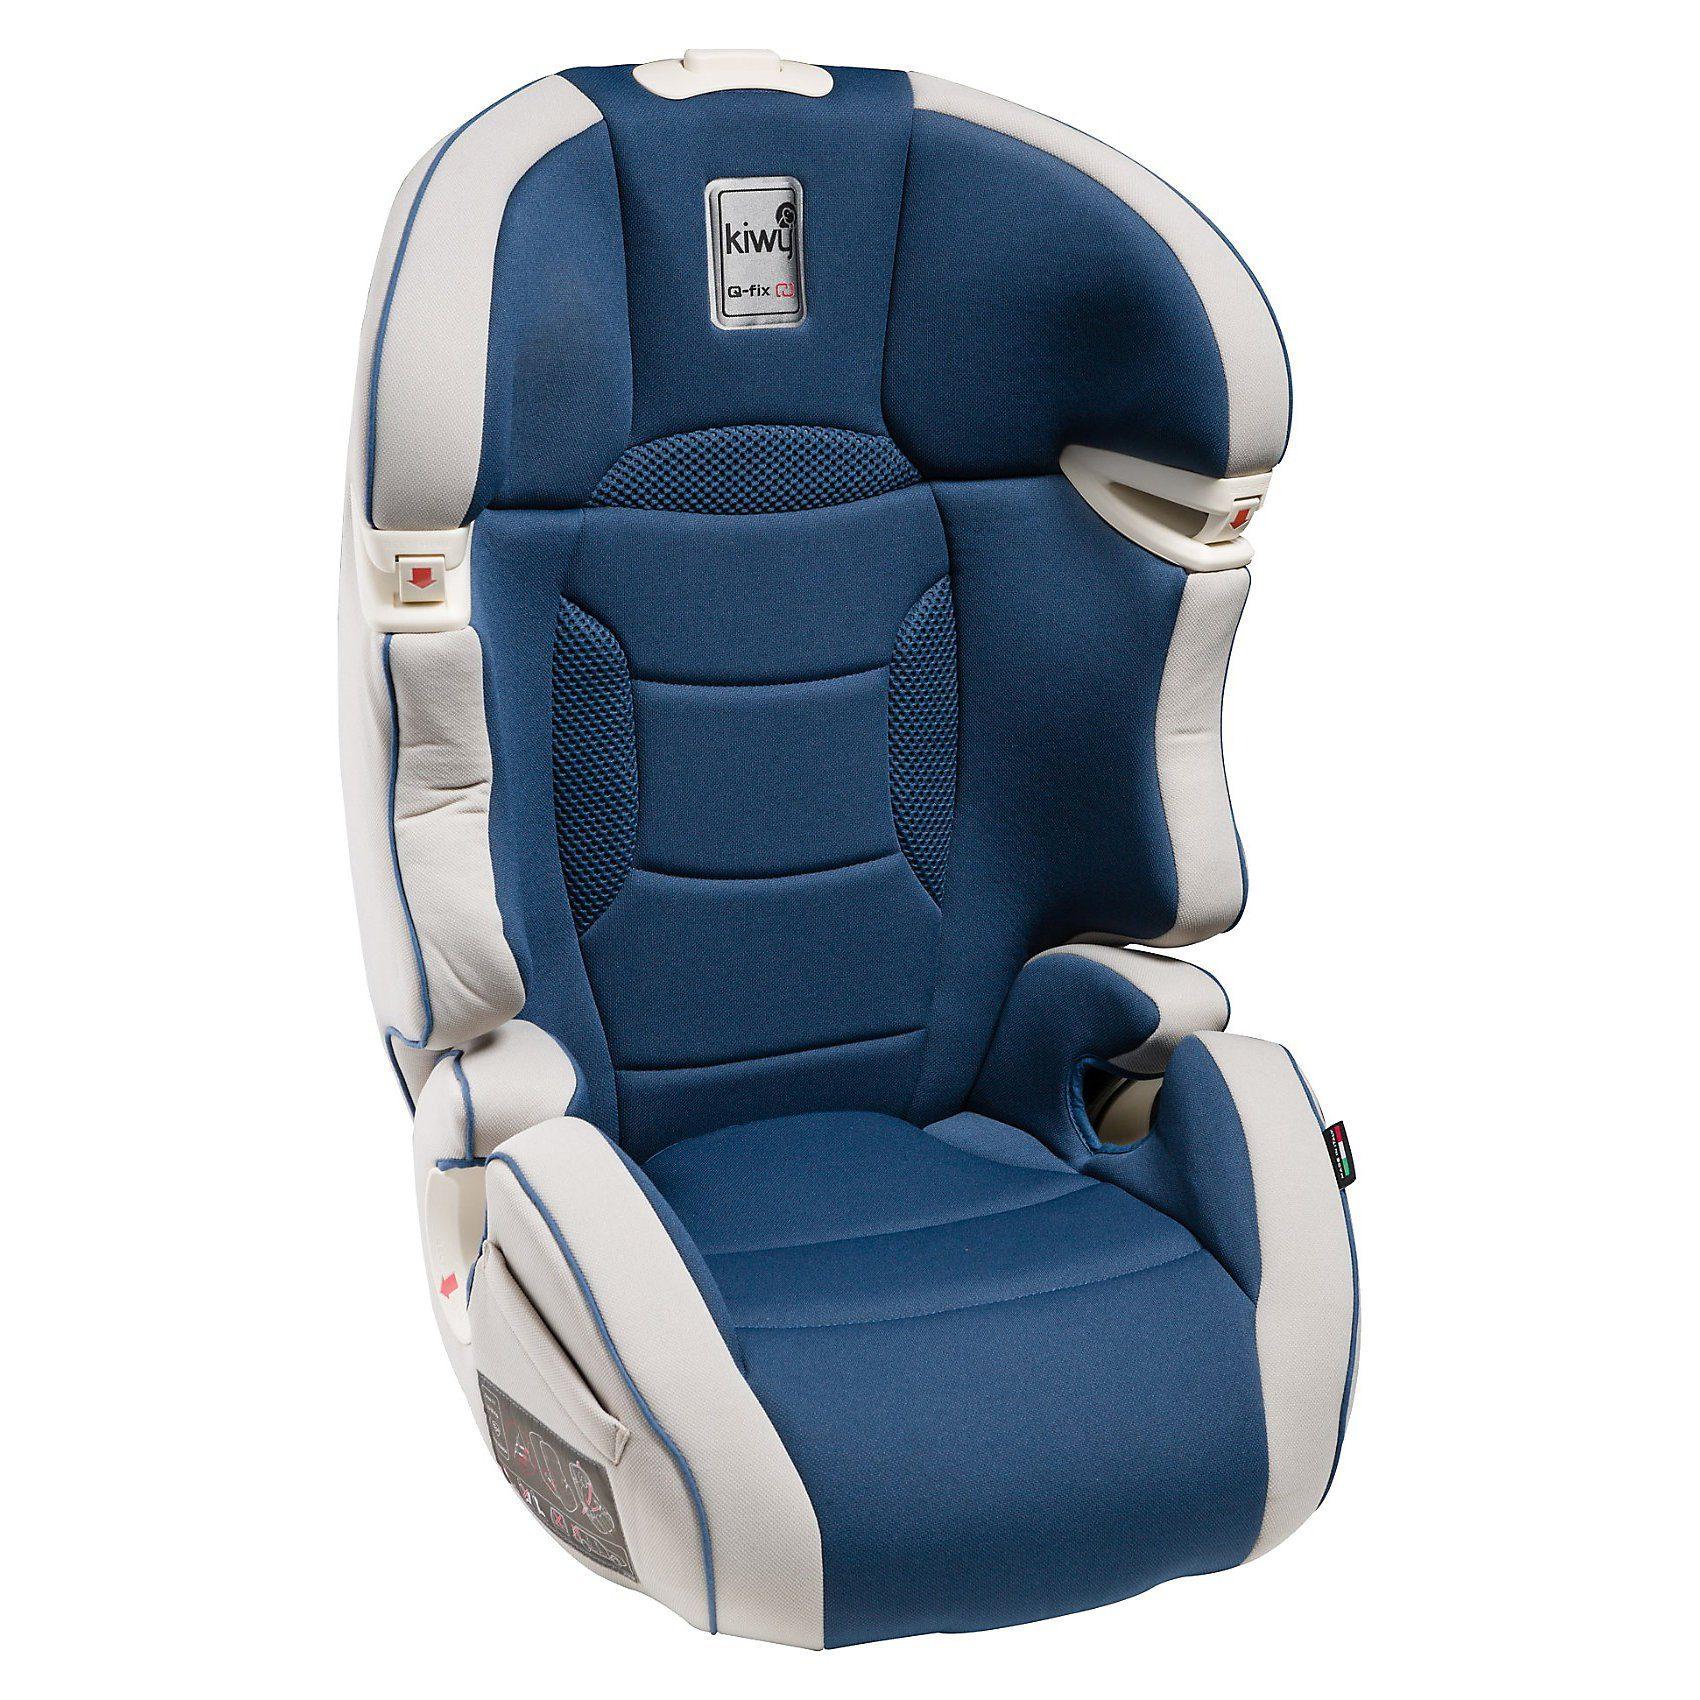 Kiwy Auto-Kindersitz SLF23 Q-Fix, Ocean, 2016